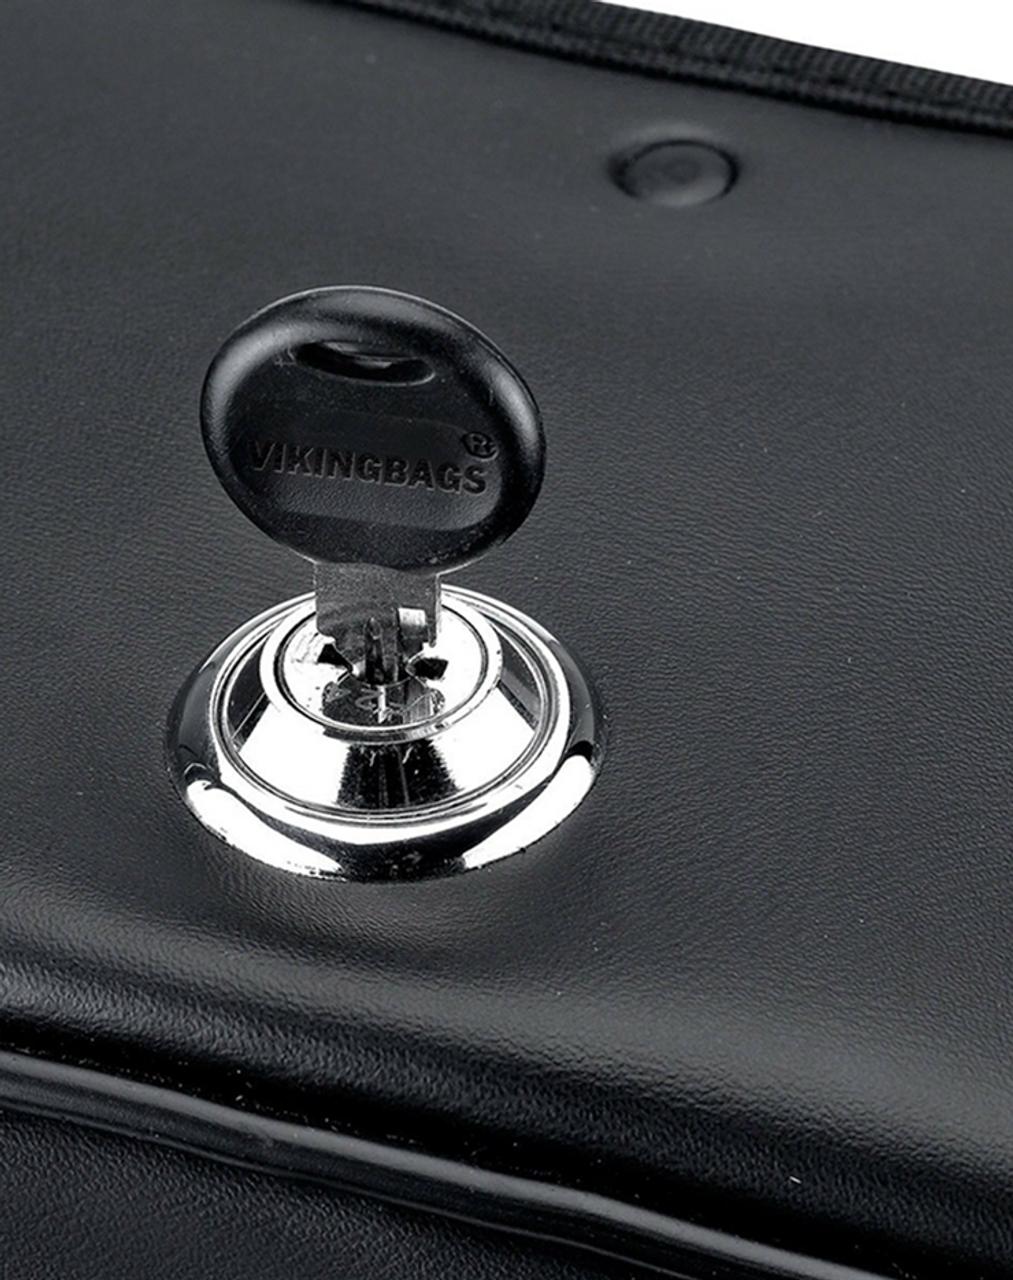 Triumph Thunderbird Charger Slanted Studded Medium Motorcycle Saddlebags Key Lock View